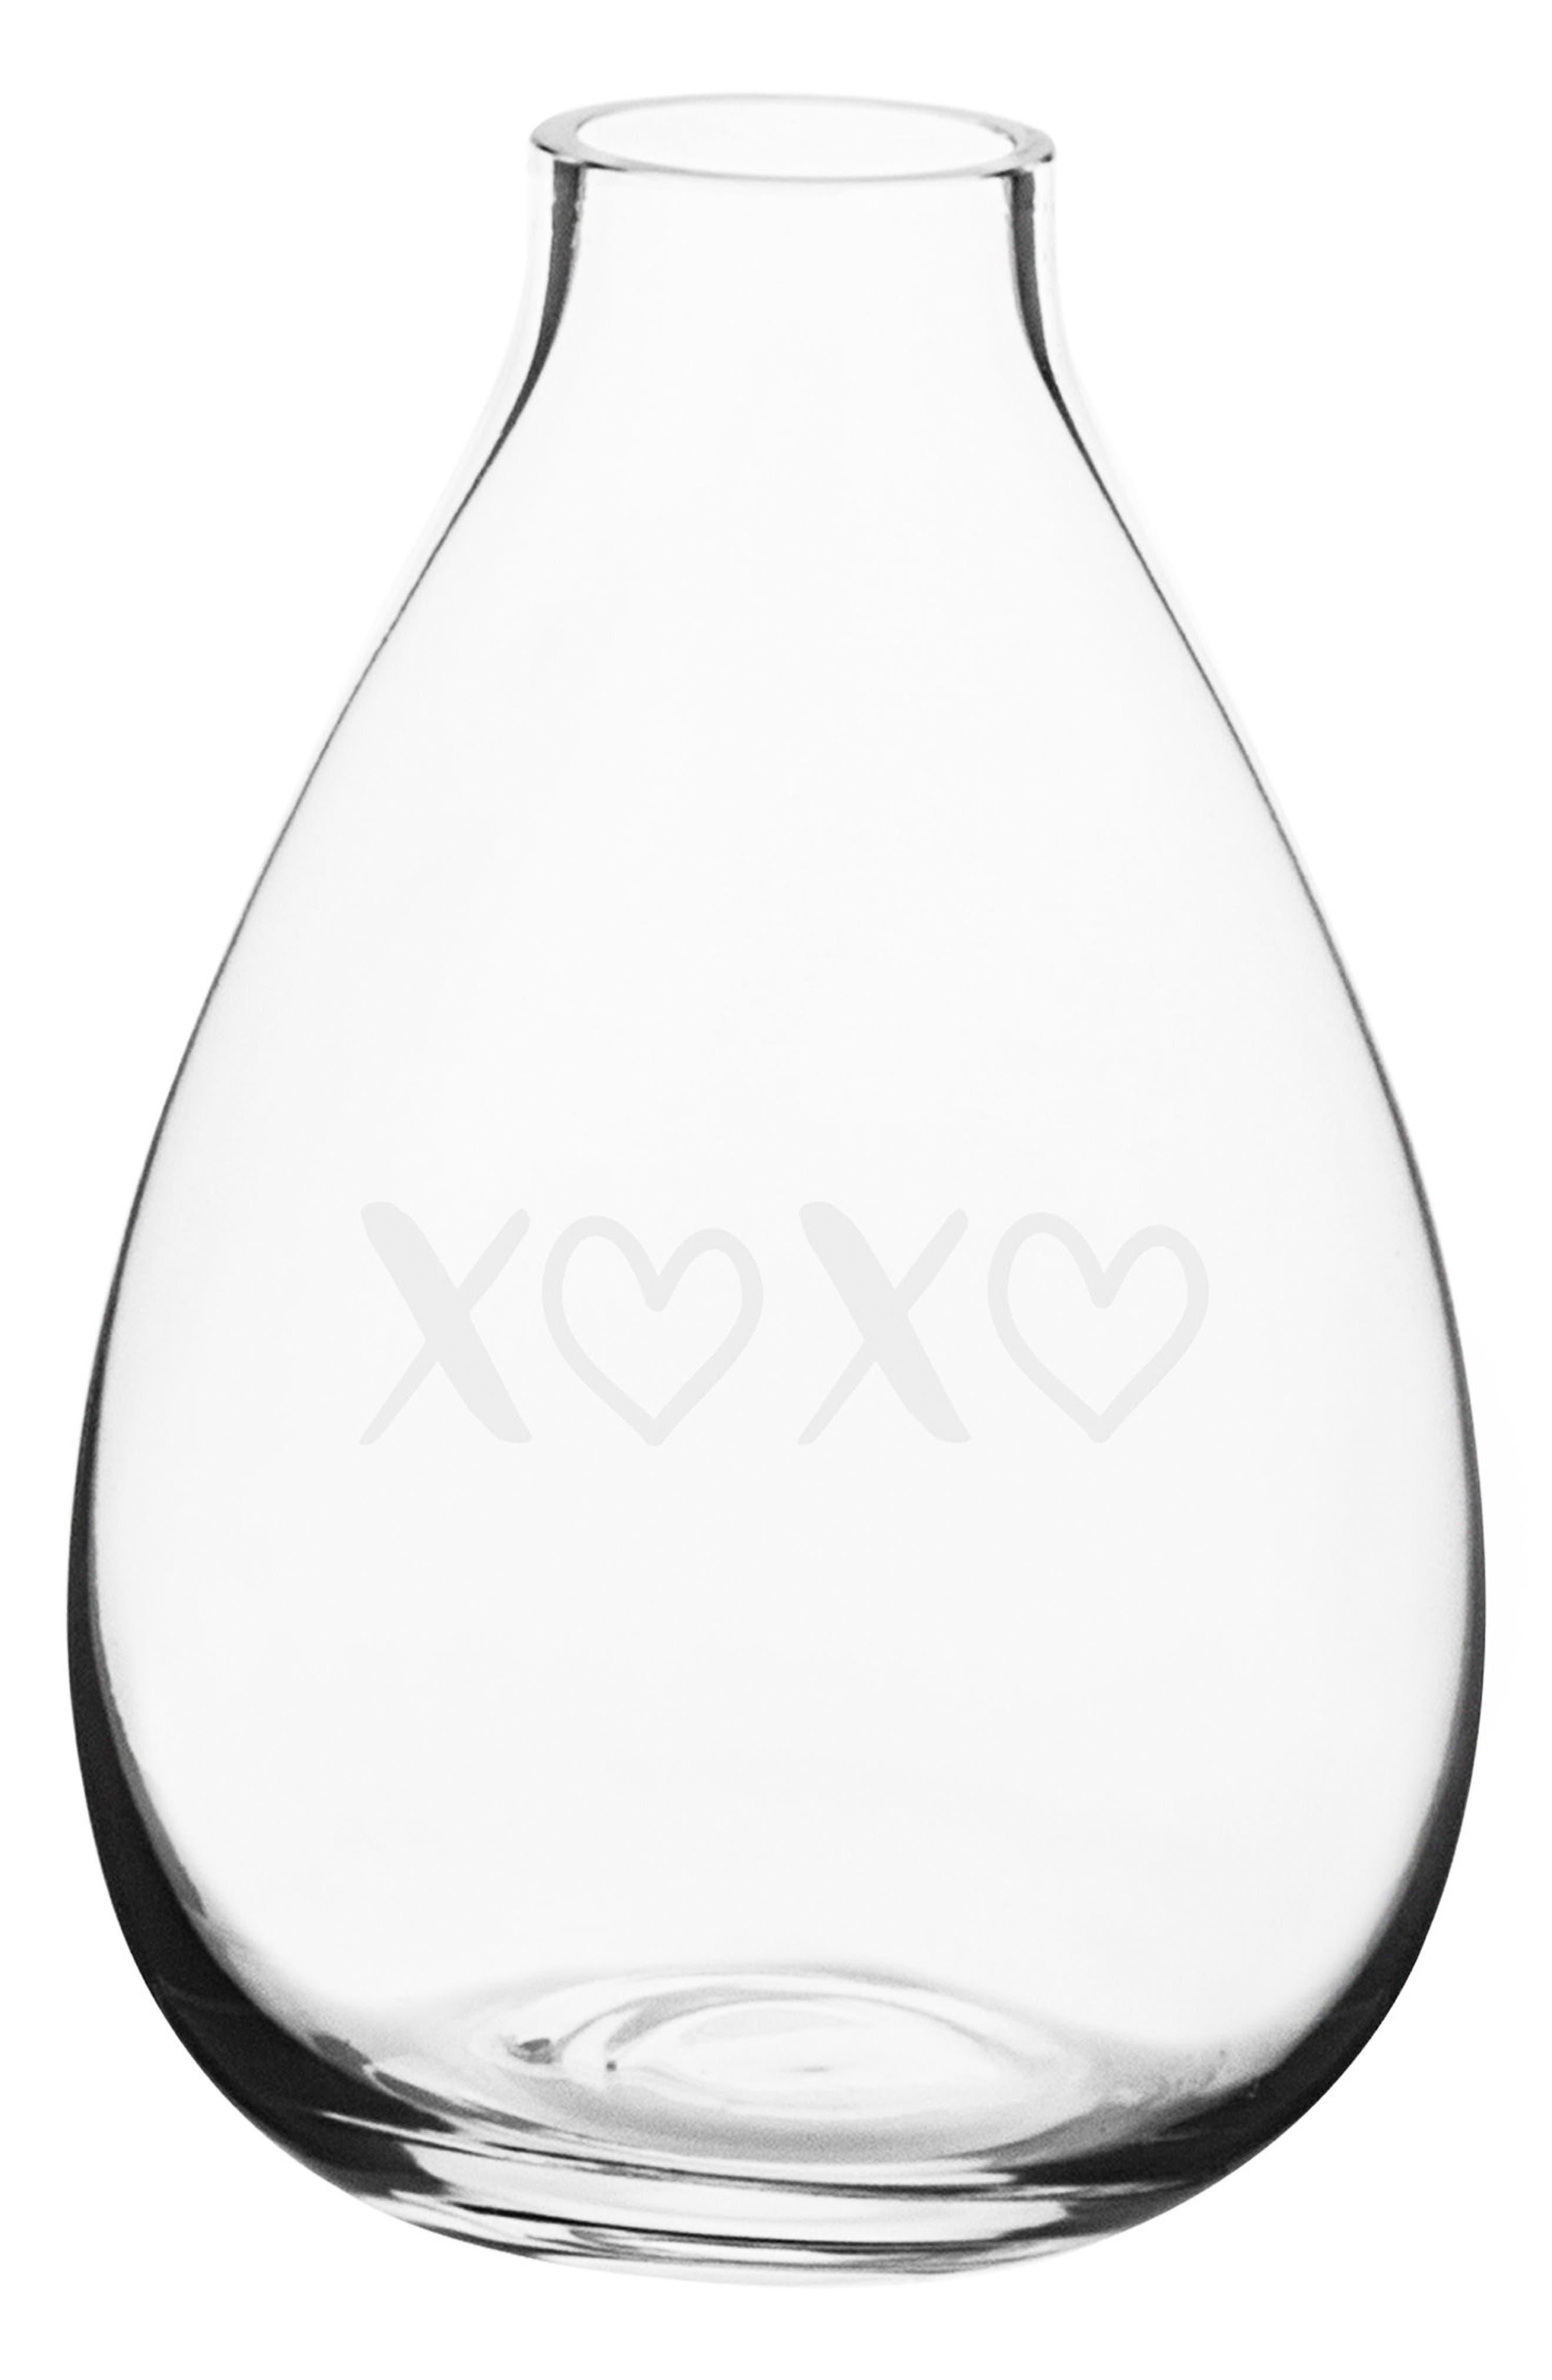 XOXO Glass Vase,                             Main thumbnail 1, color,                             100